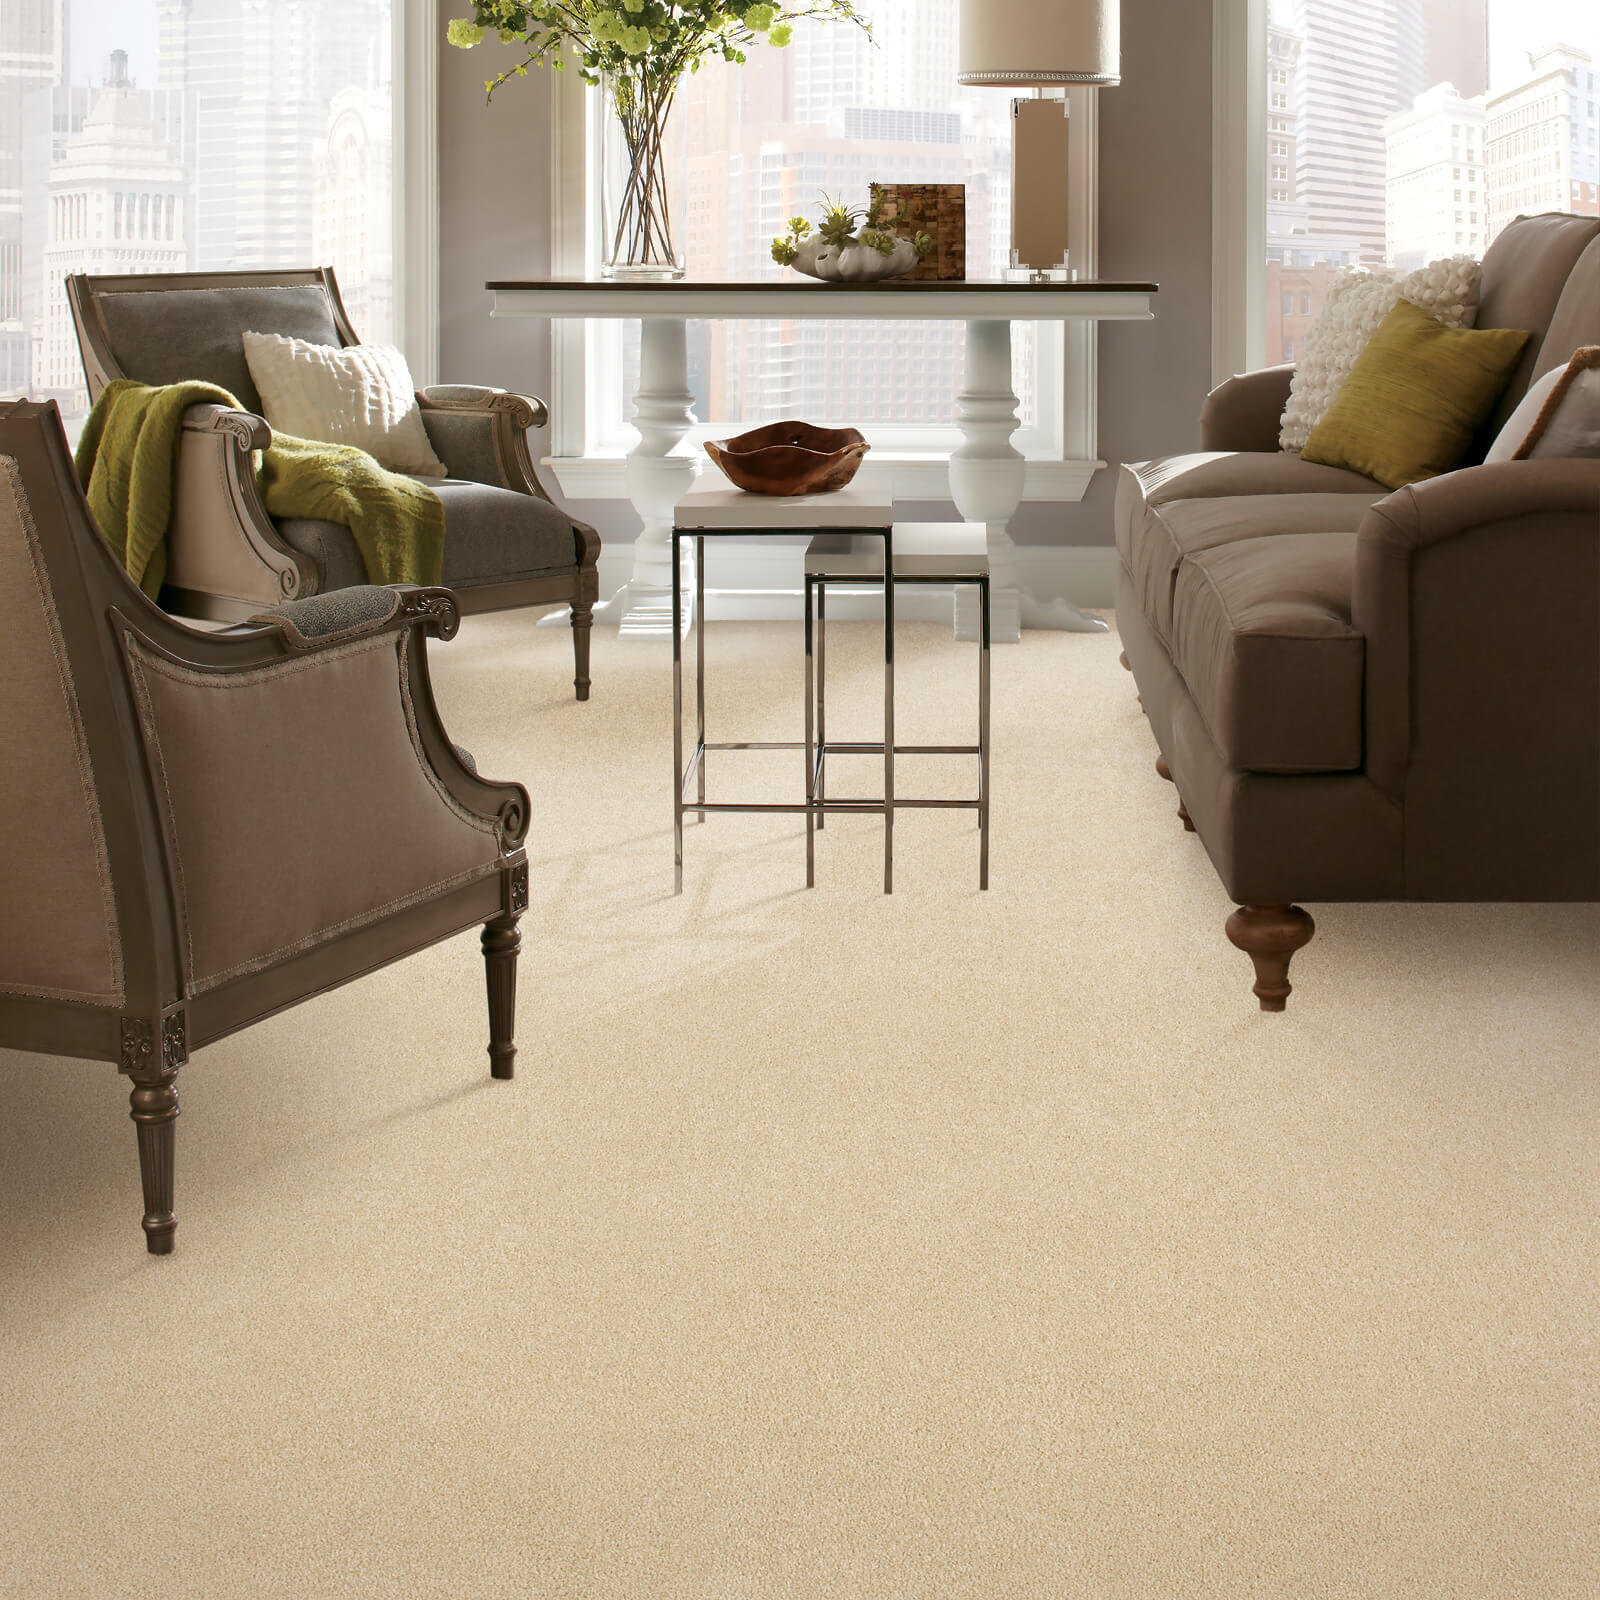 Posh Appeal | Flooring by Wilson's Carpet Plus